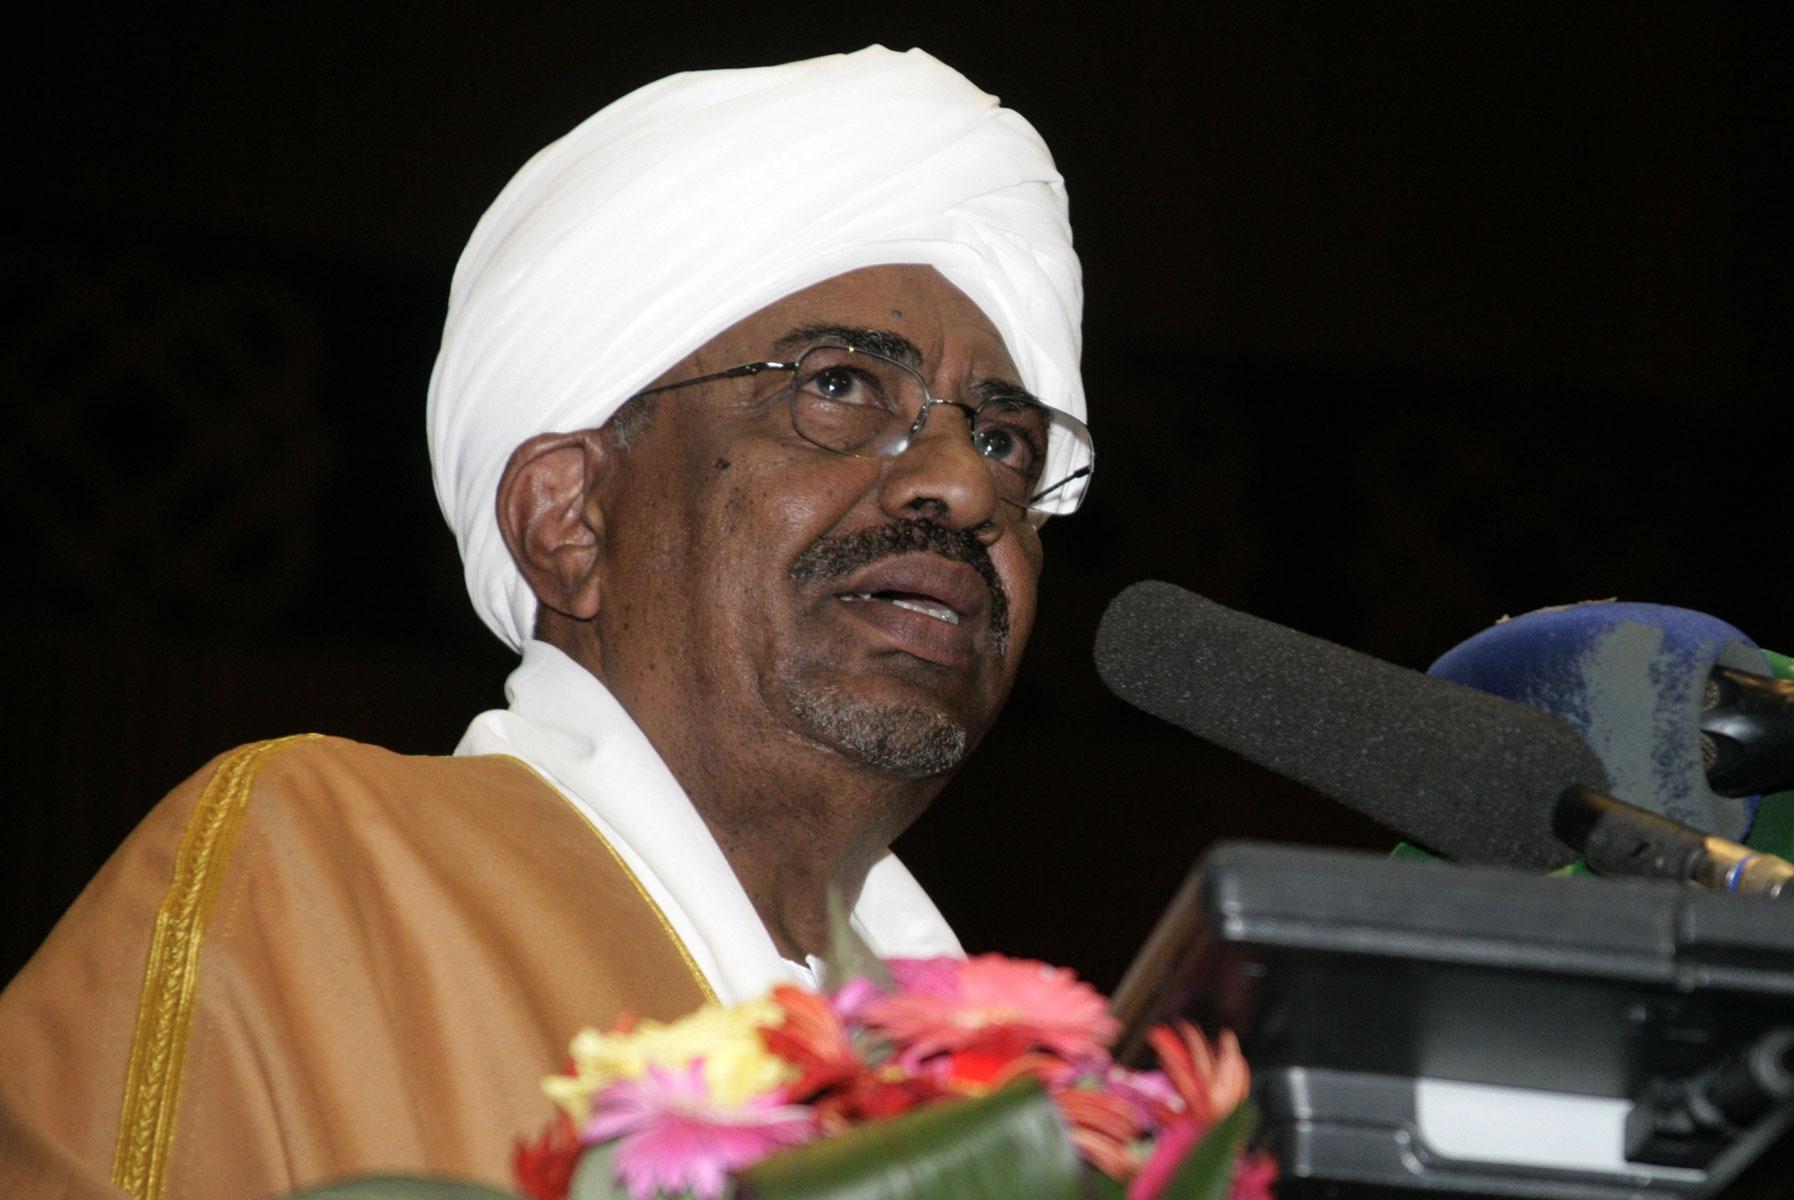 Омар аль-Башир